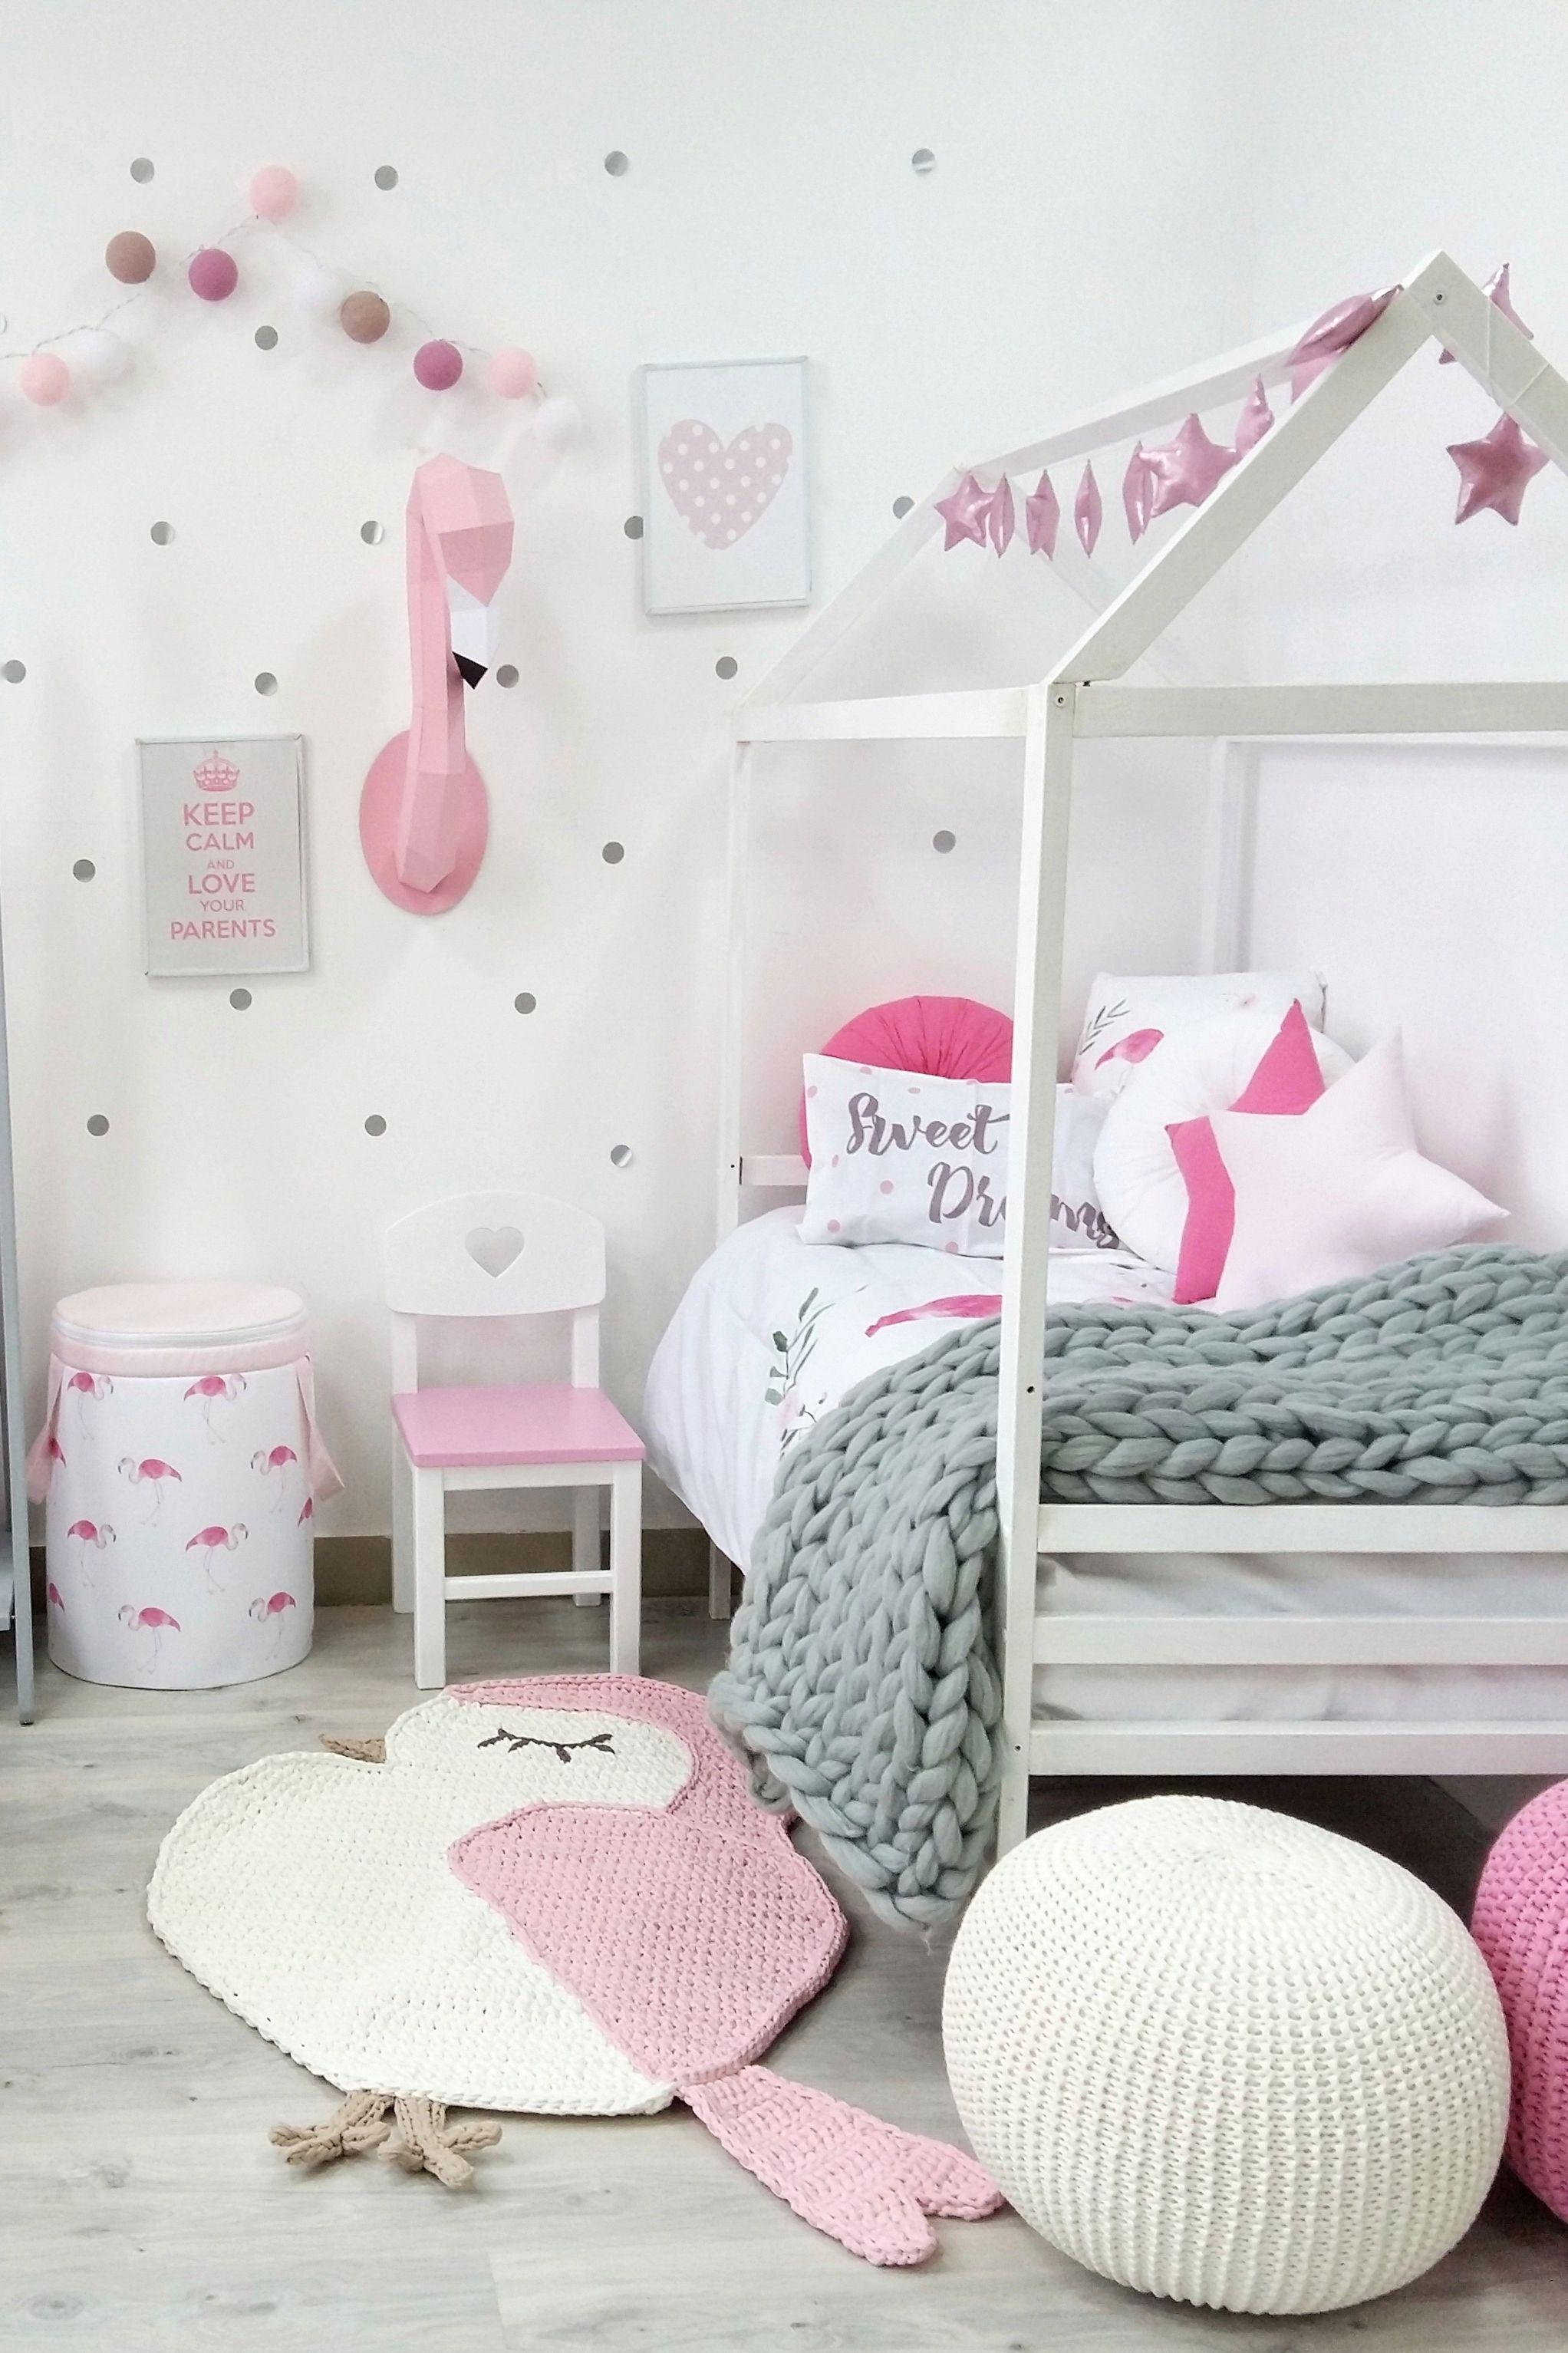 Flamingo Bedding Set And Toys Basket To Buy On Etsy